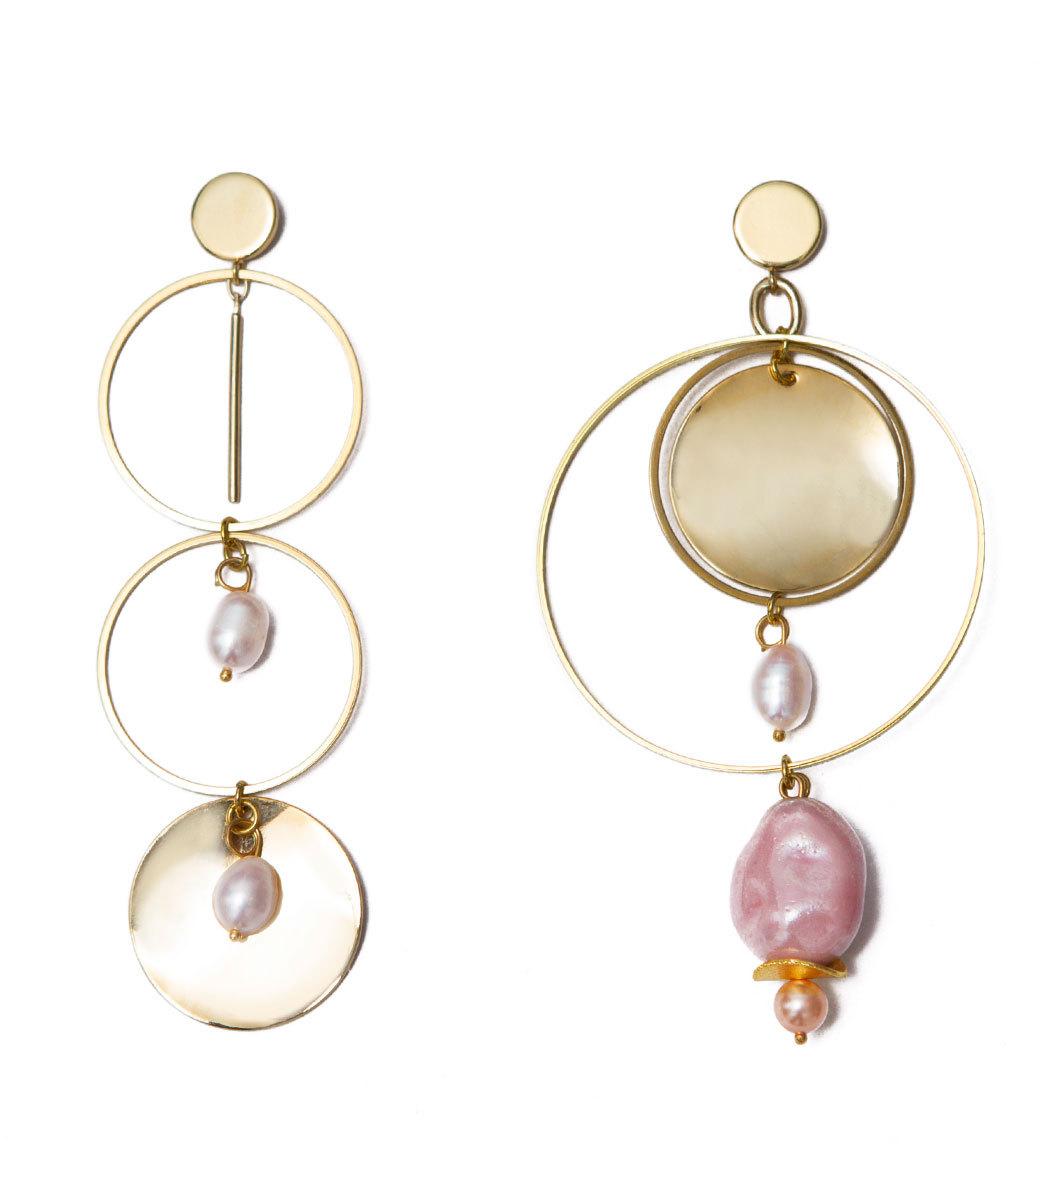 MOUNSER JEWELRY Gold Corona Earrings